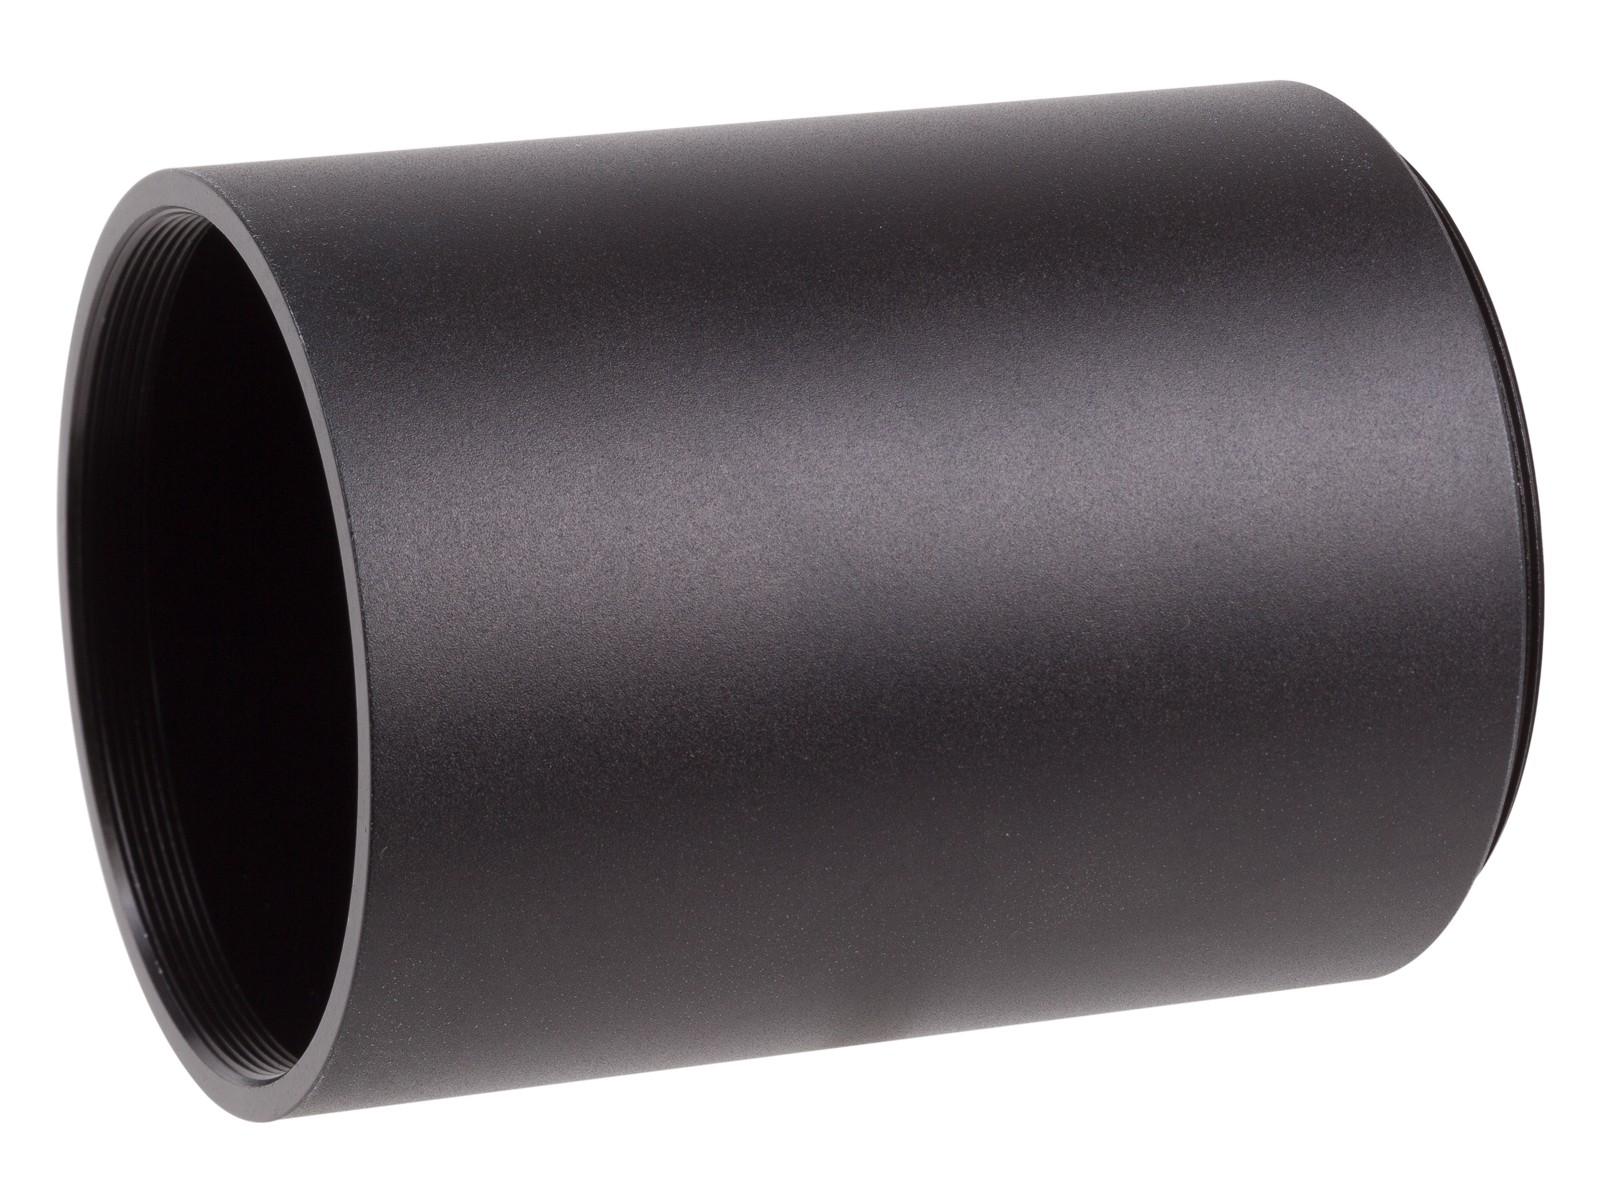 MTC Optics Pro Series Sunshade, 50mm